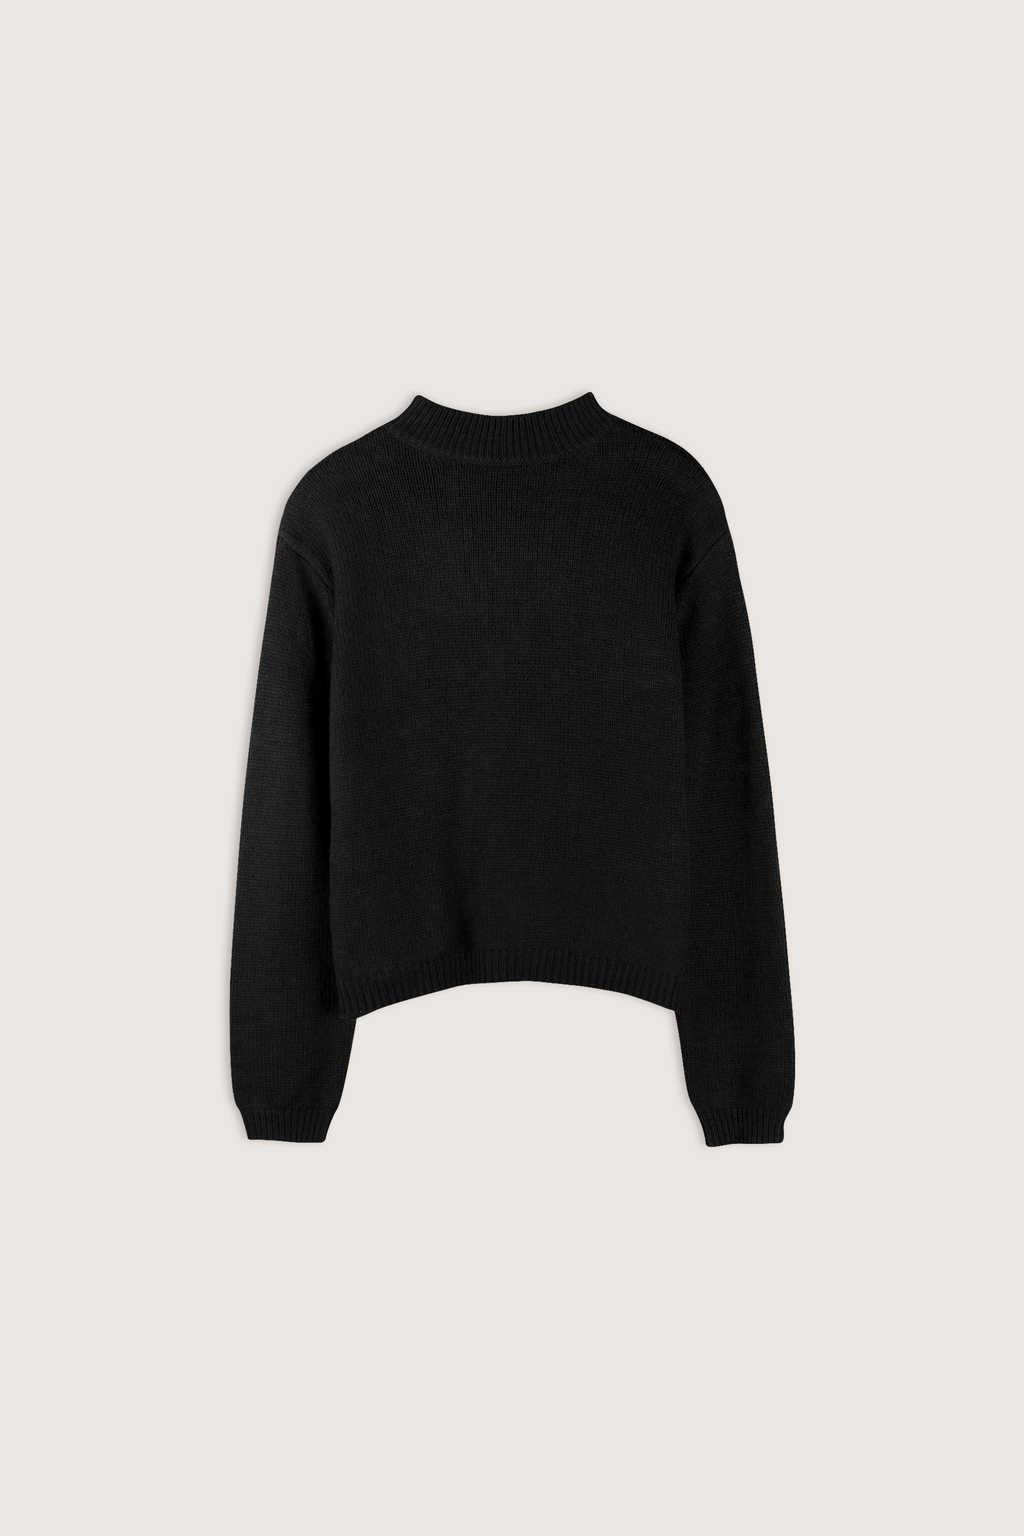 Sweater 1783 Black 5